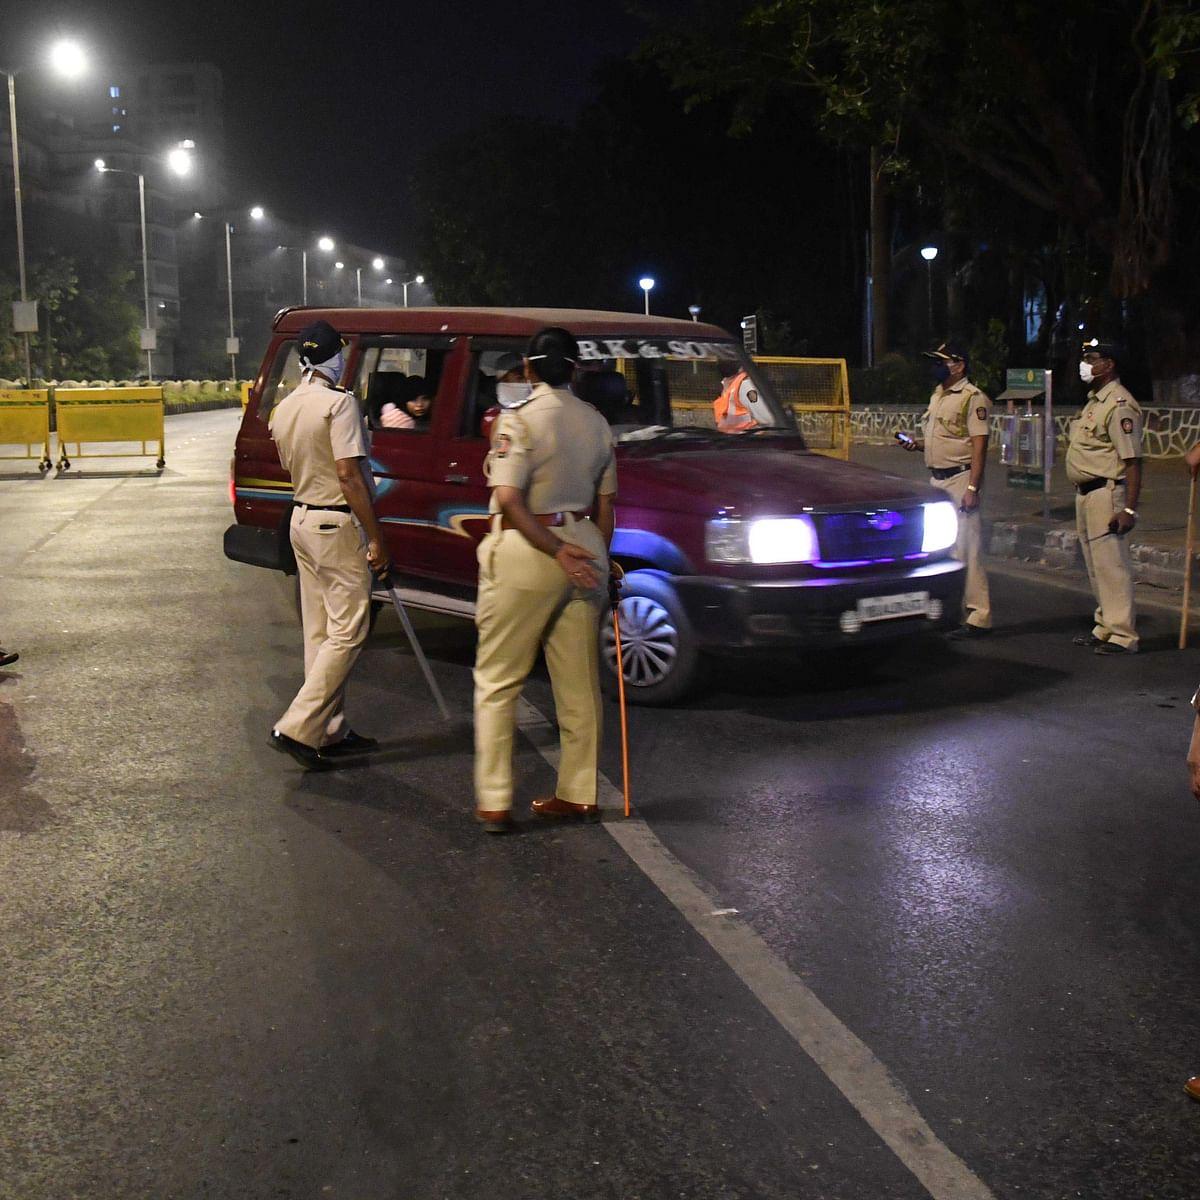 'Night curfew is not lockdown': BMC chief amid confusion amongst Mumbaikars